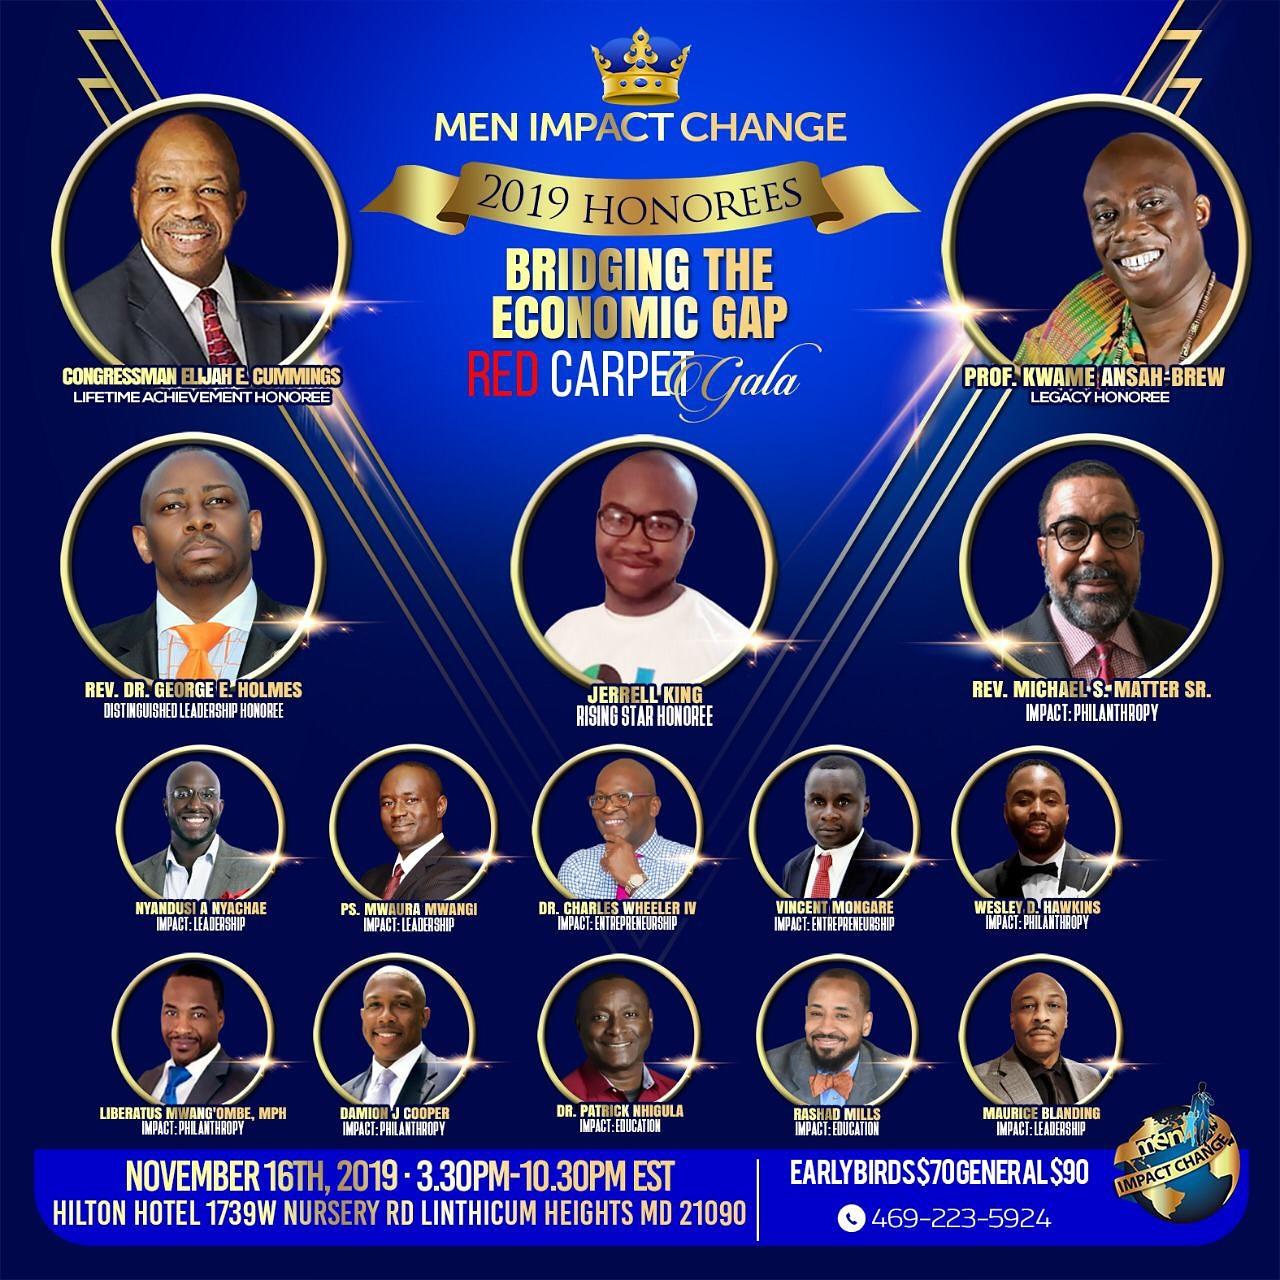 2019 Men Impact Change Honorees